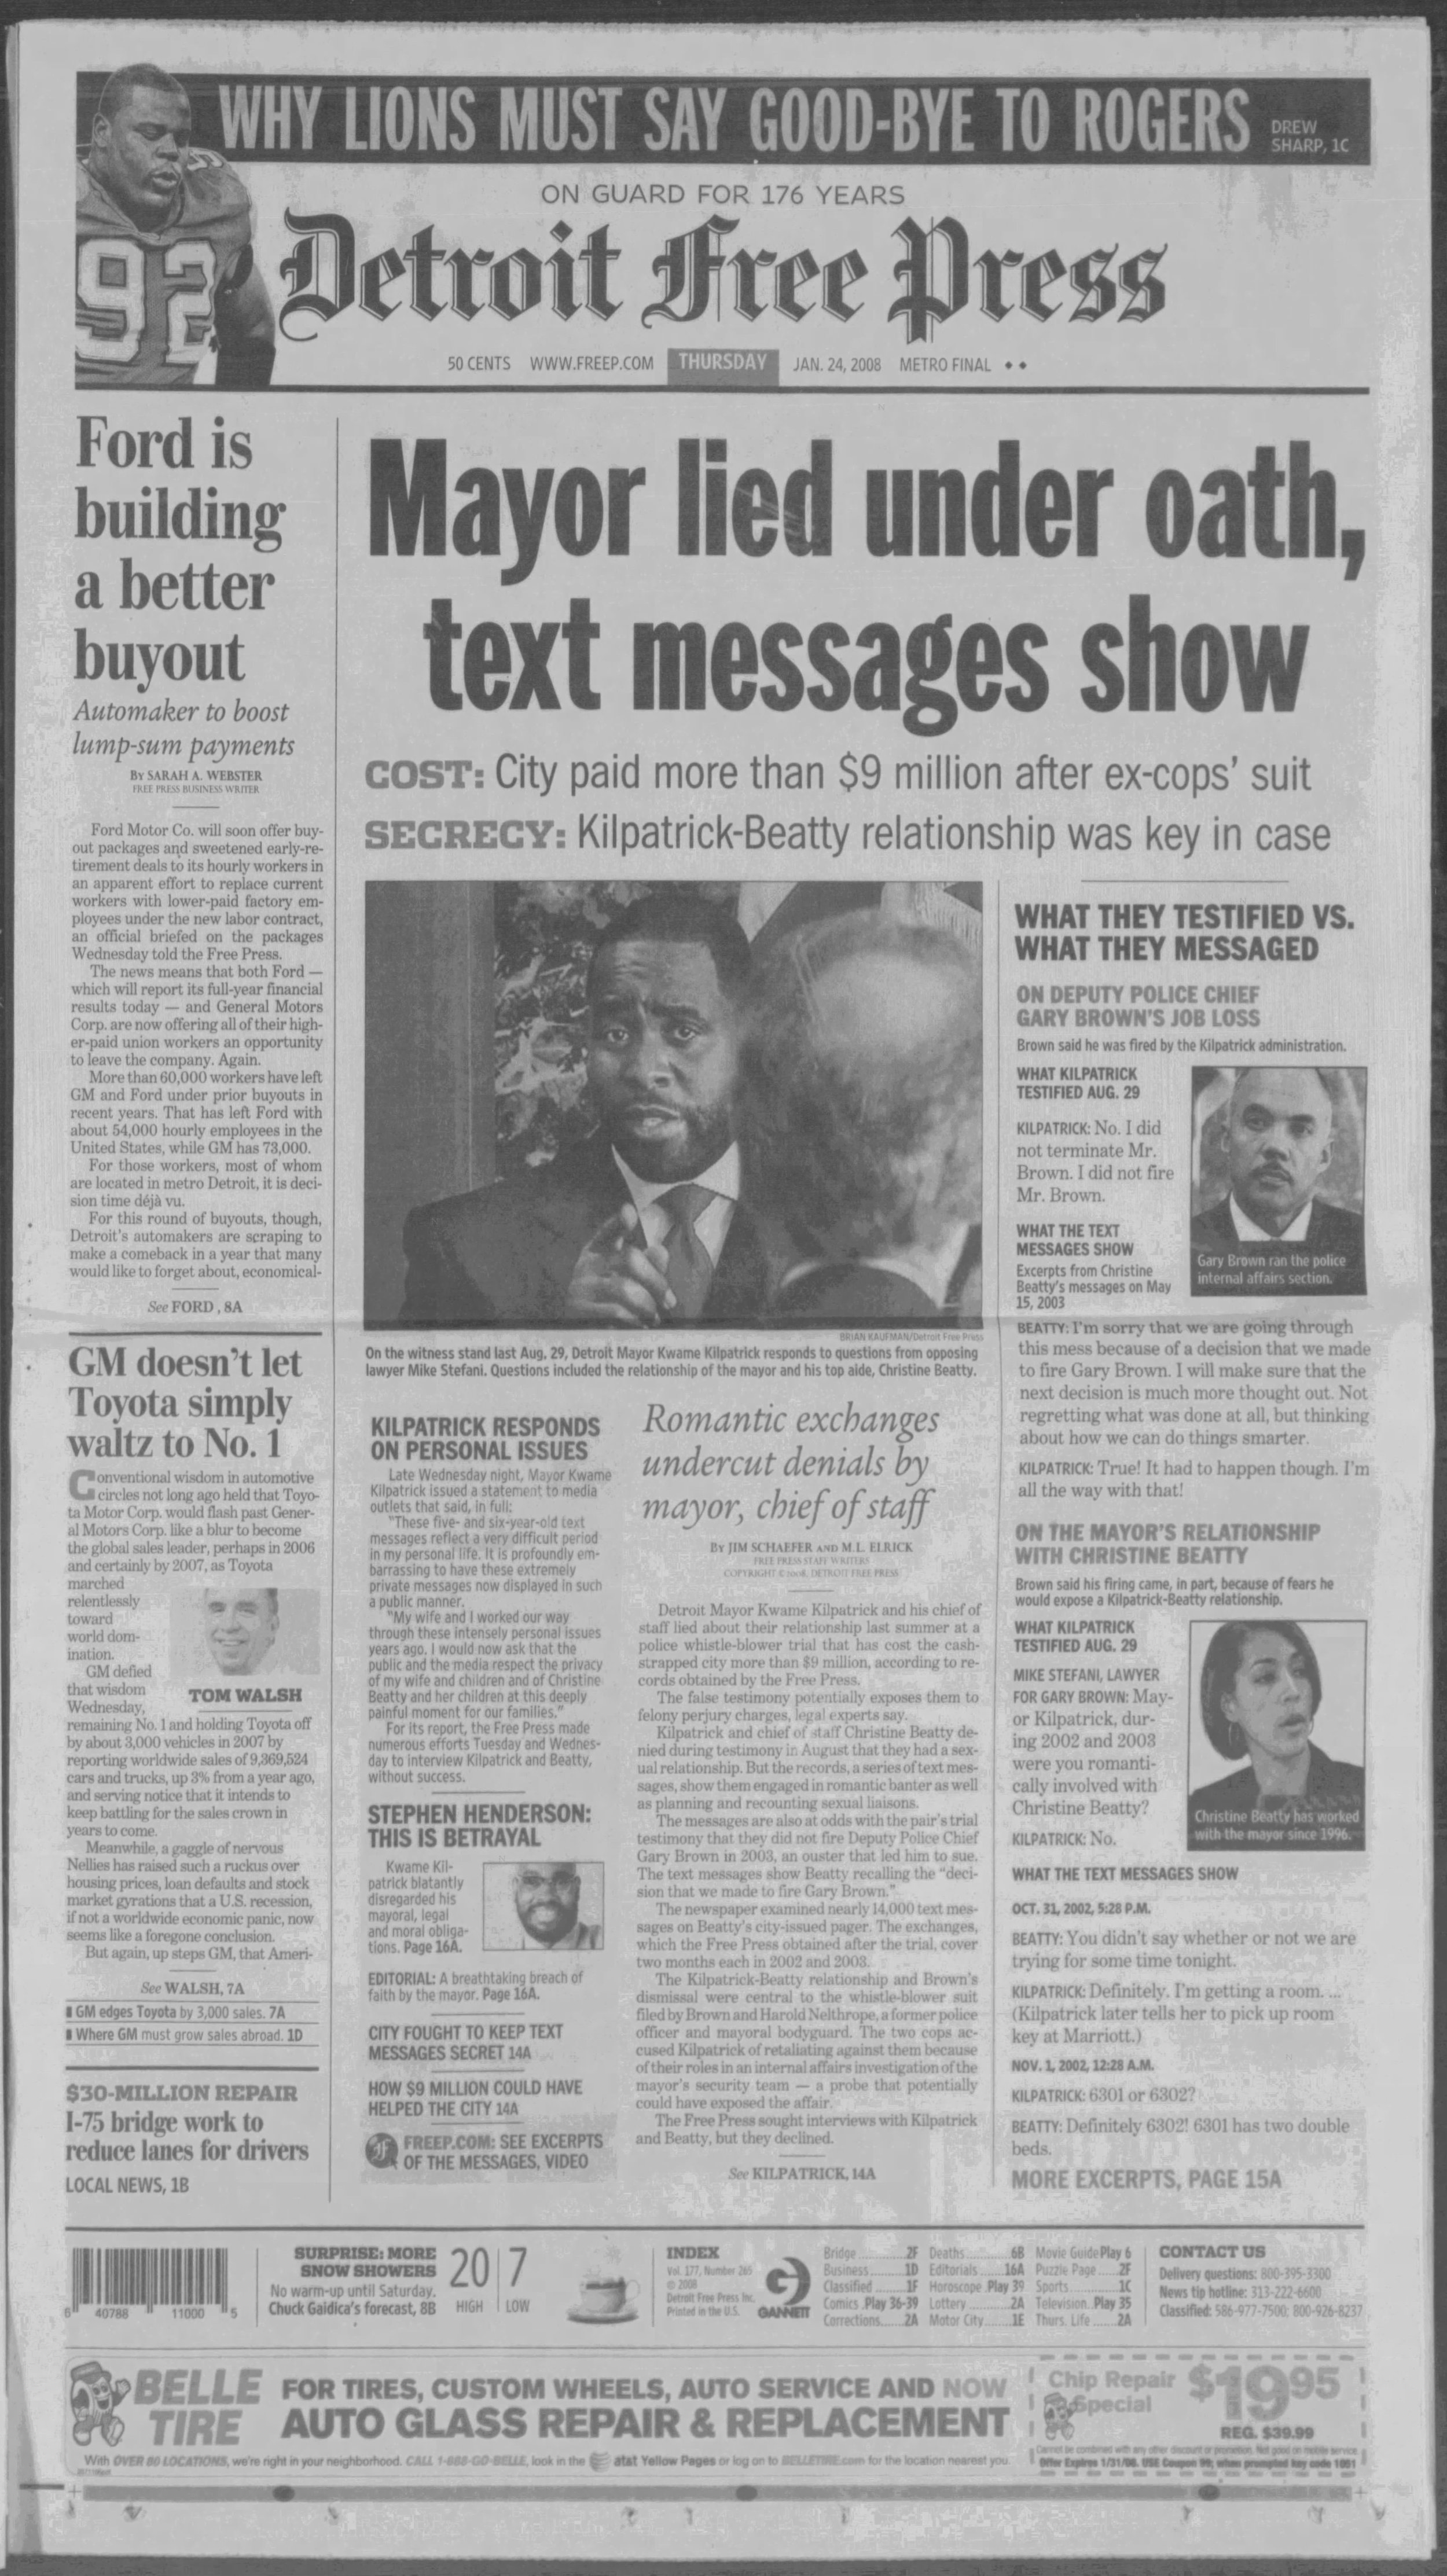 Detroit_Free_Press_Thu__Jan_24__2008_.jpg